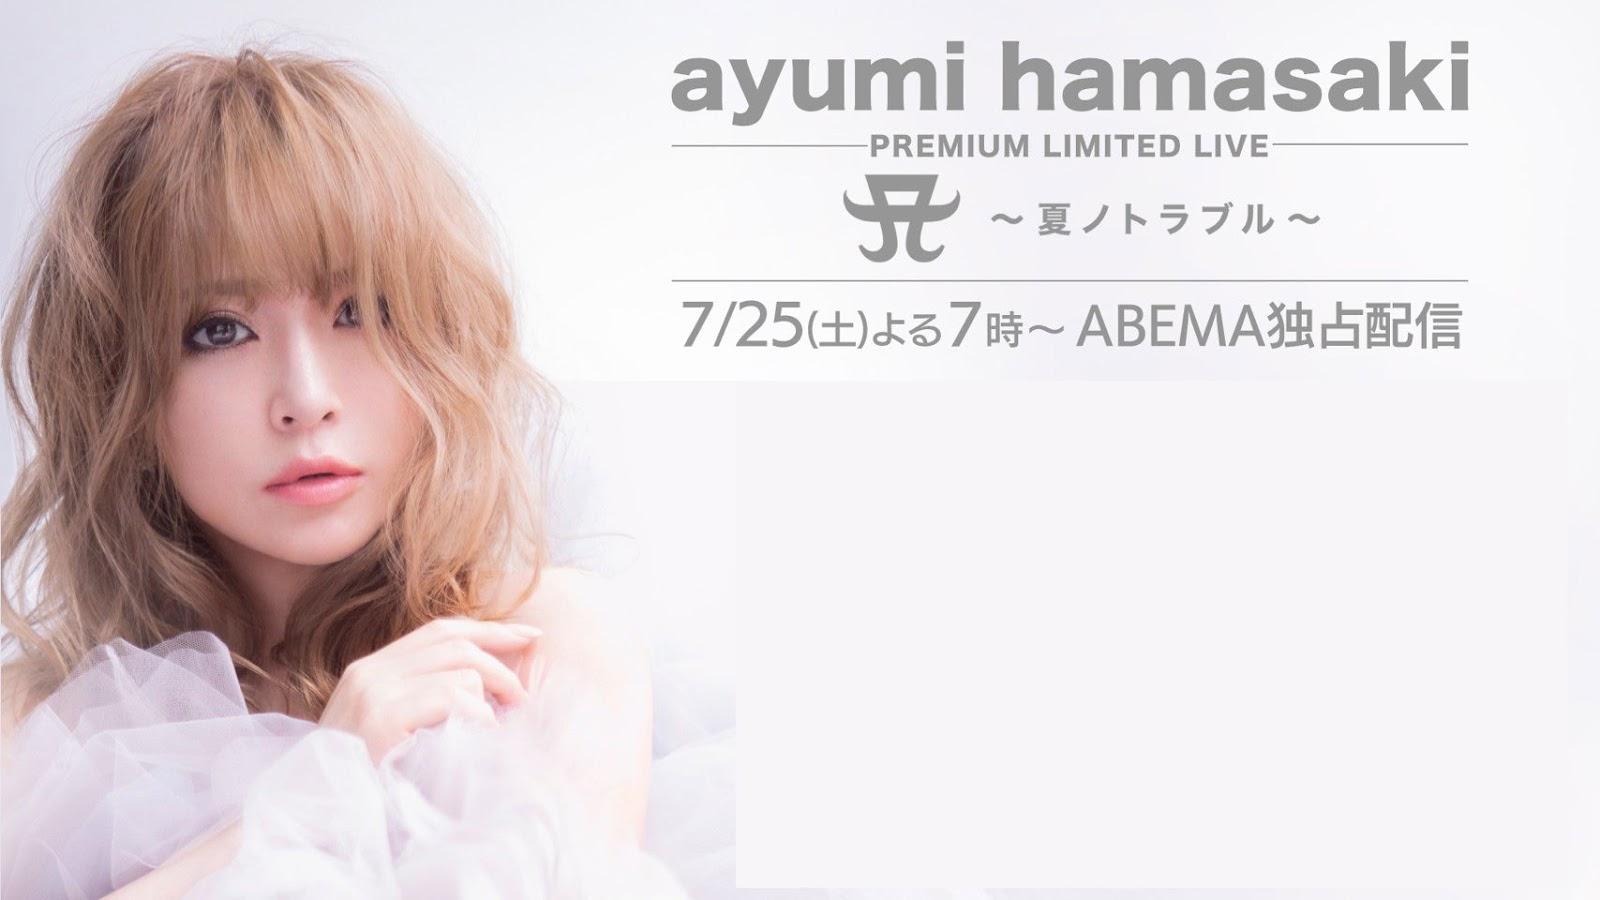 ayumi hamasaki PREMIUM LIMITED LIVE A ~夏ノトラブル~ [2020.07.25+WEBRIP+RAR]